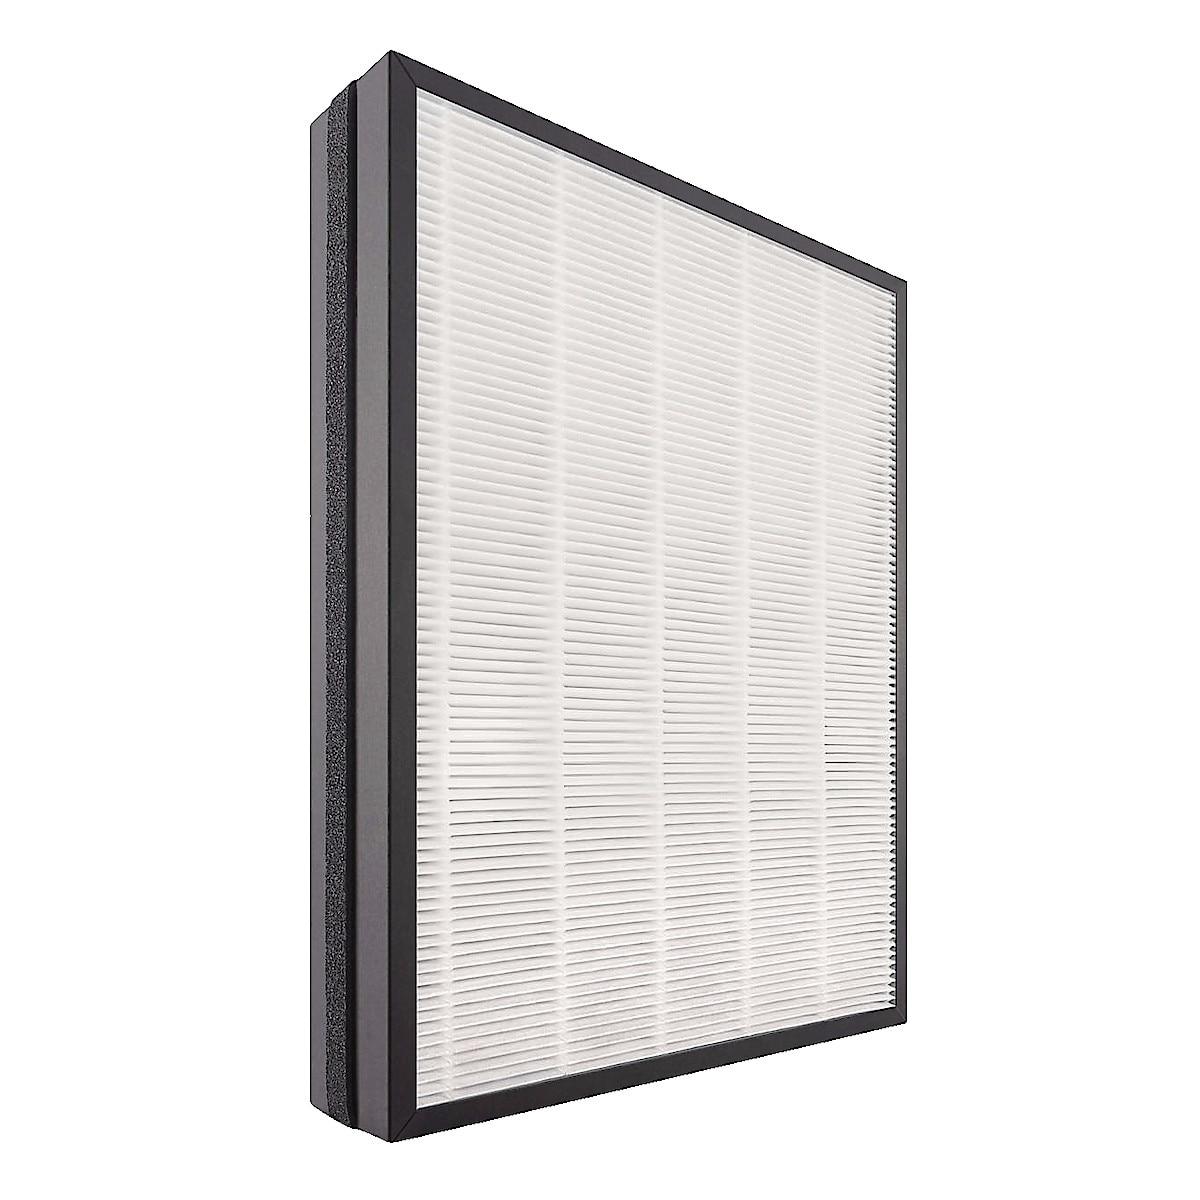 HEPA-filter Philips AC4158/00